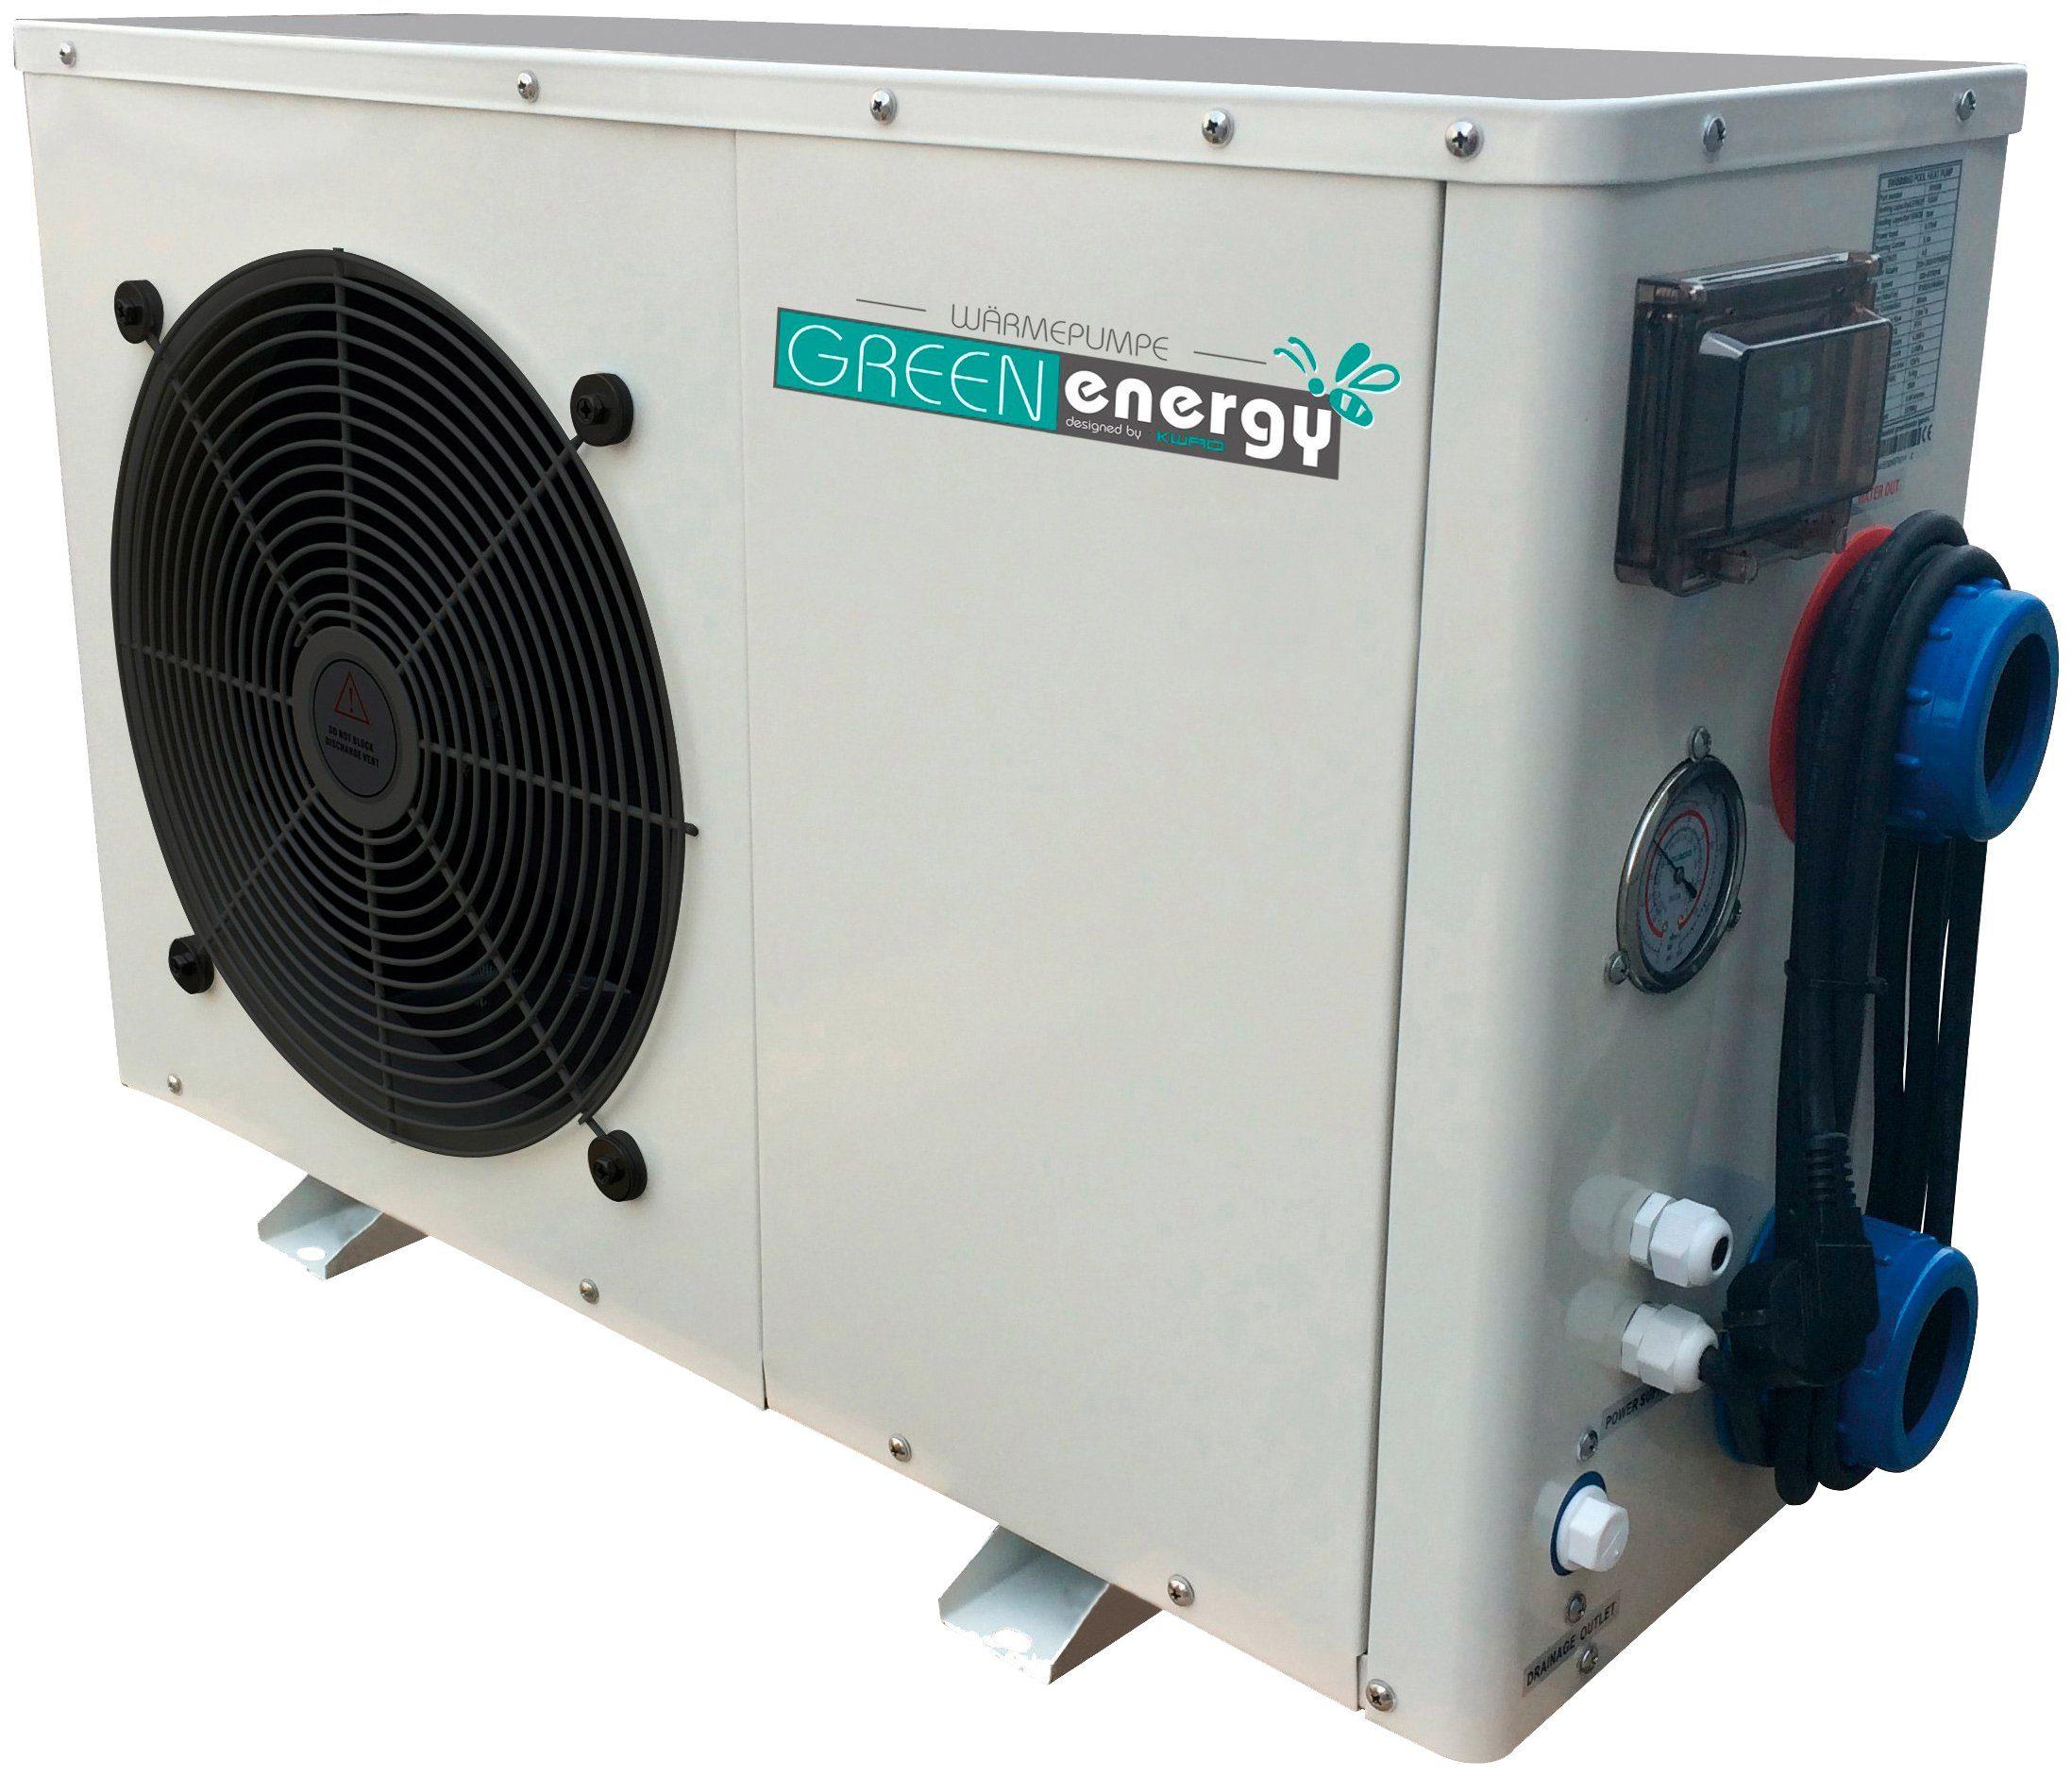 KWAD Wärmepumpen »Green Energy 10«, für Pools bis 45.000 l